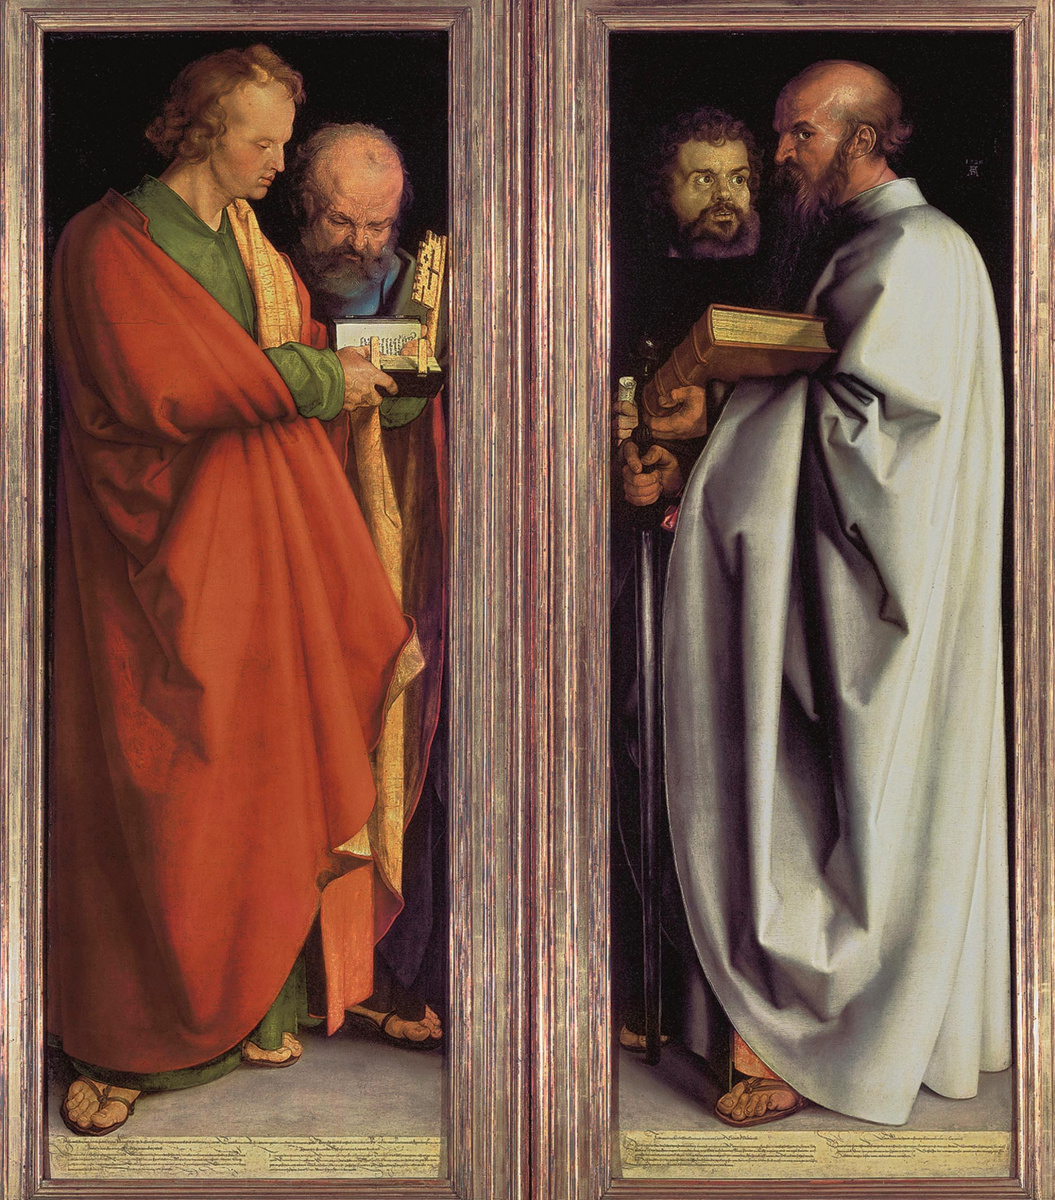 Albrecht Durer. Four Apostles (John, Peter, Mark, Paul)